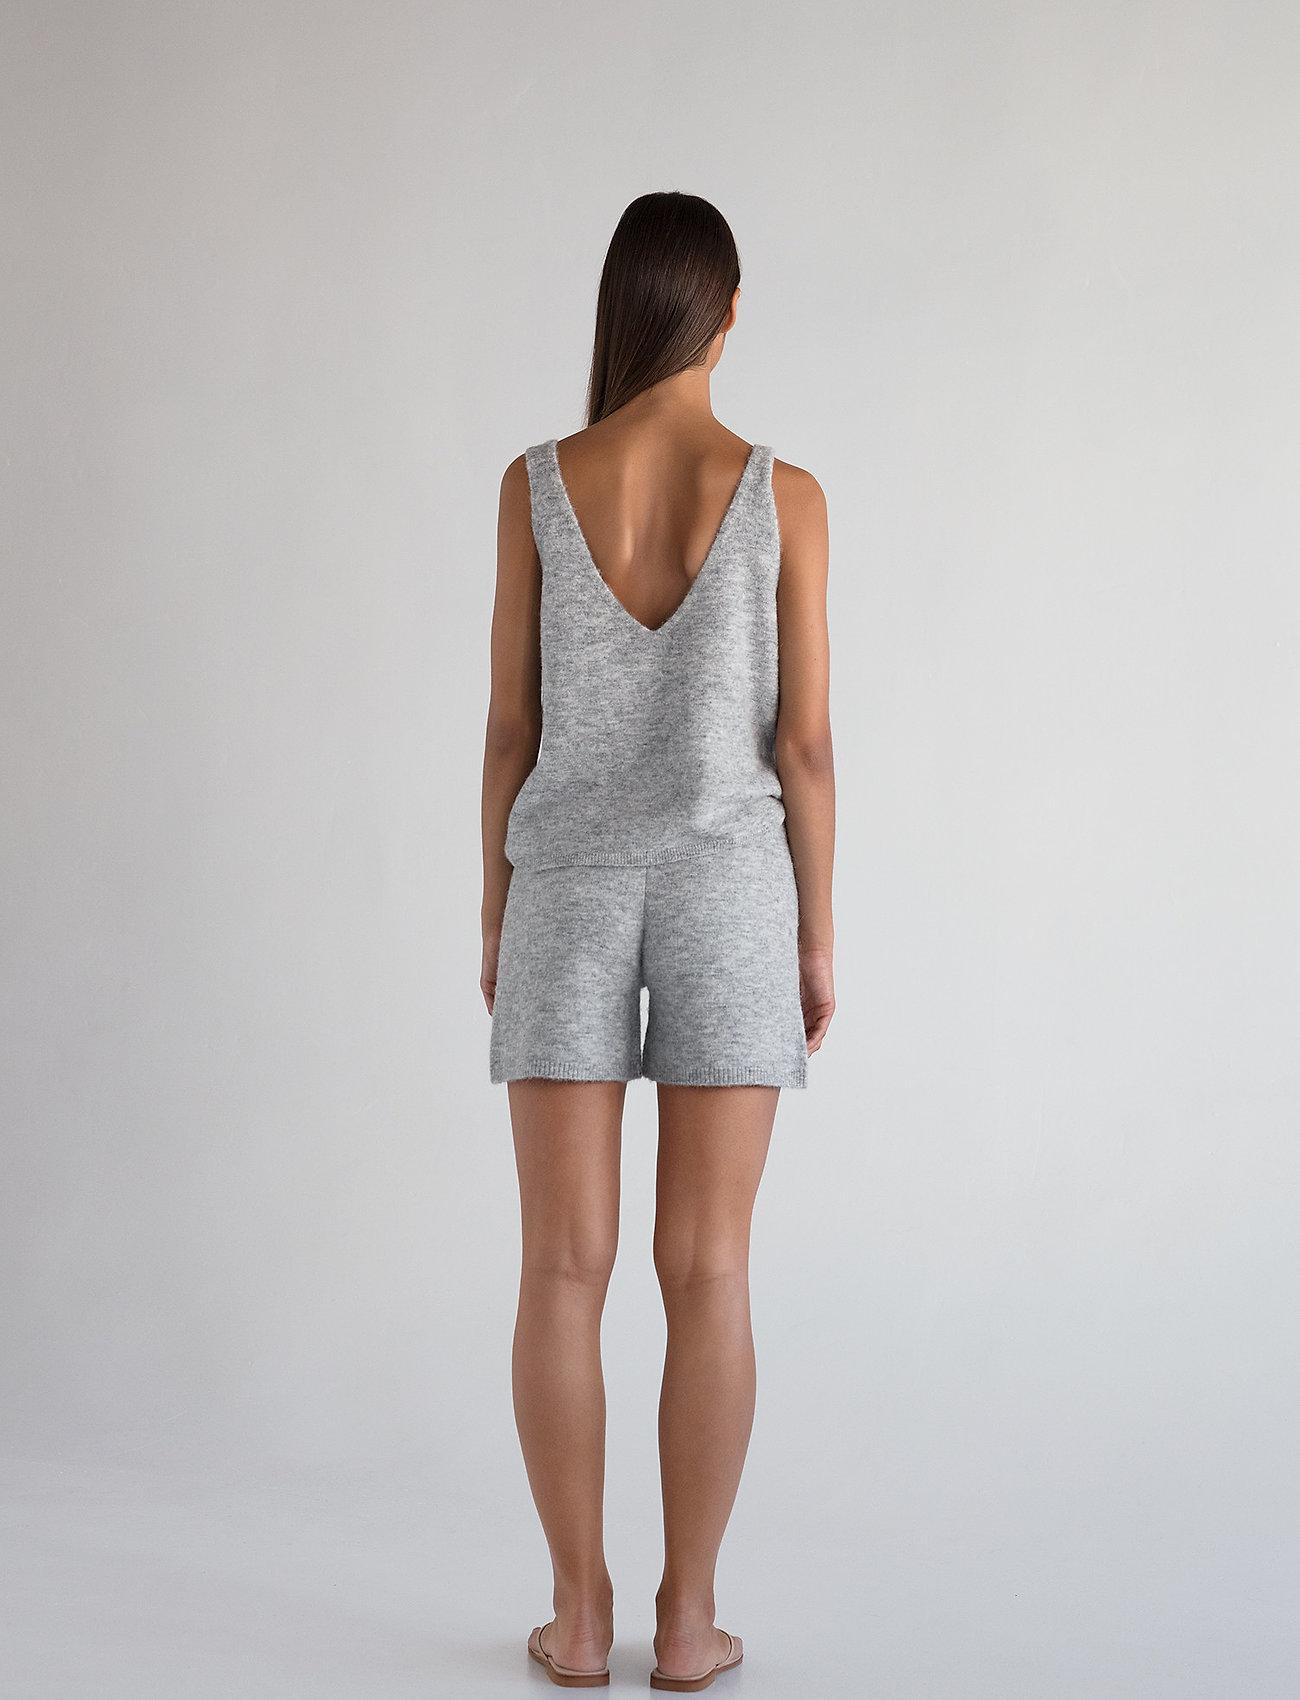 Stylein - ETOILE TOP - tops zonder mouwen - light grey - 3